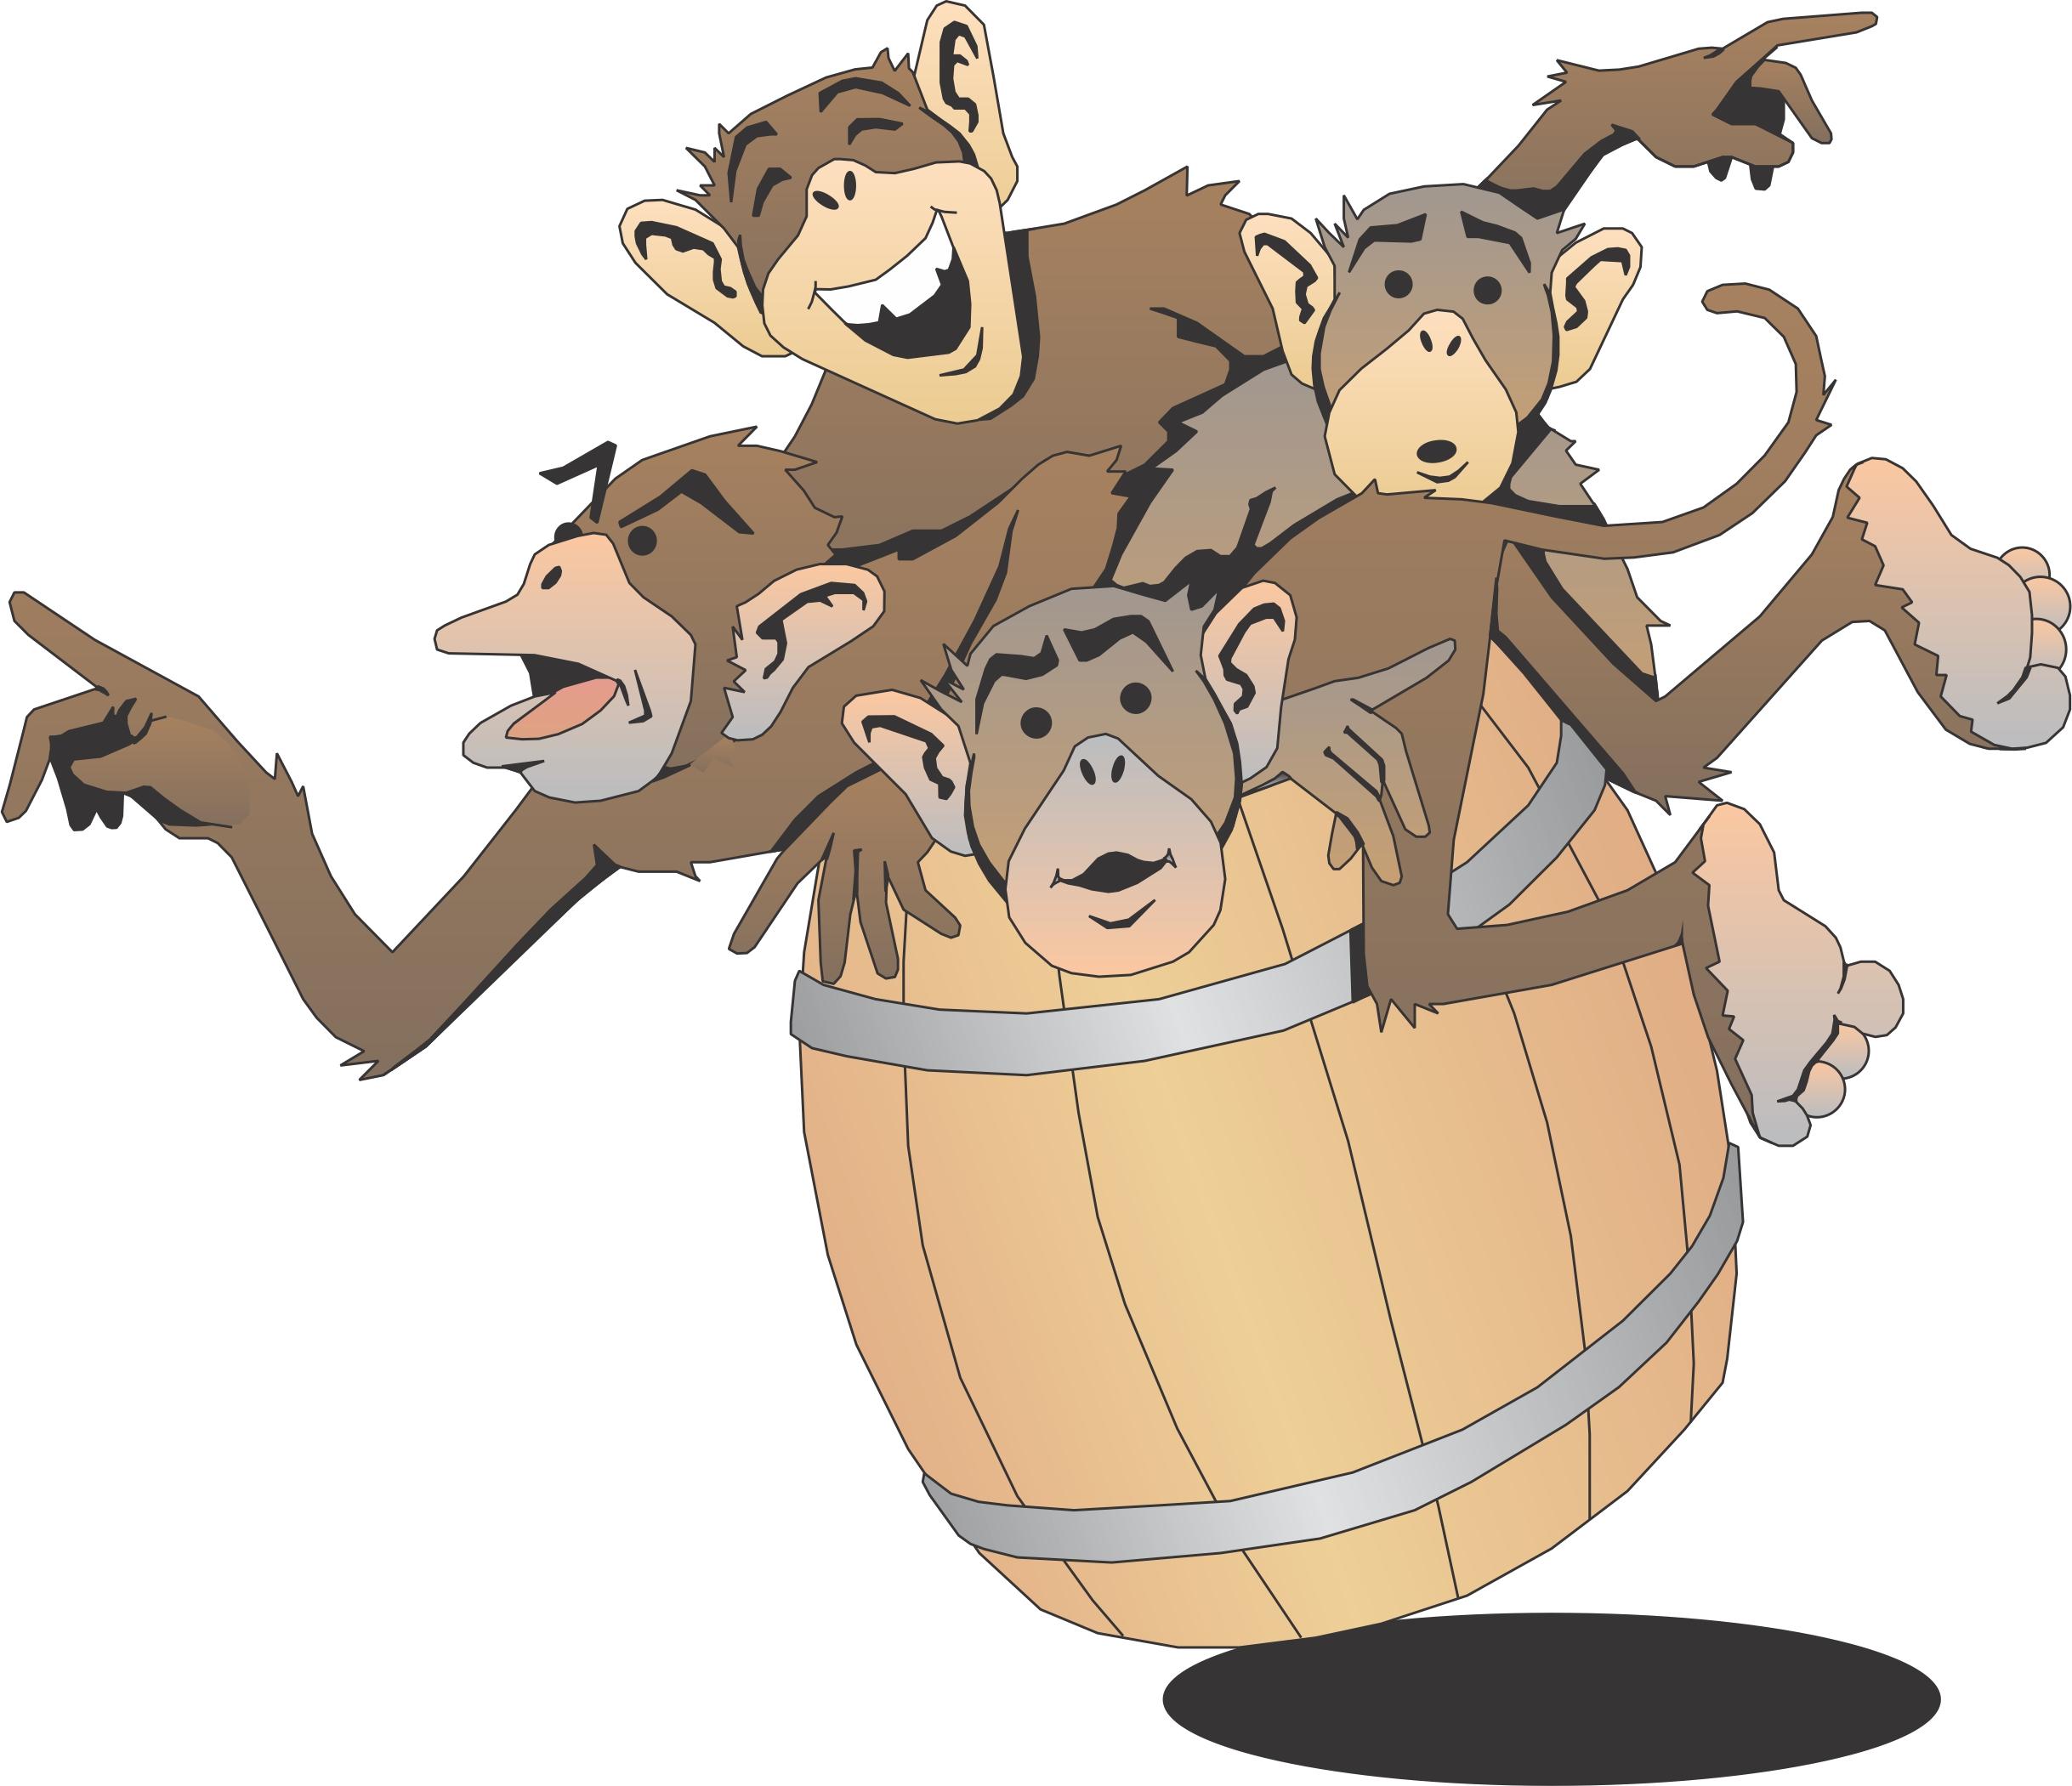 Cartoon in a spiritual. Barrel clipart monkeys